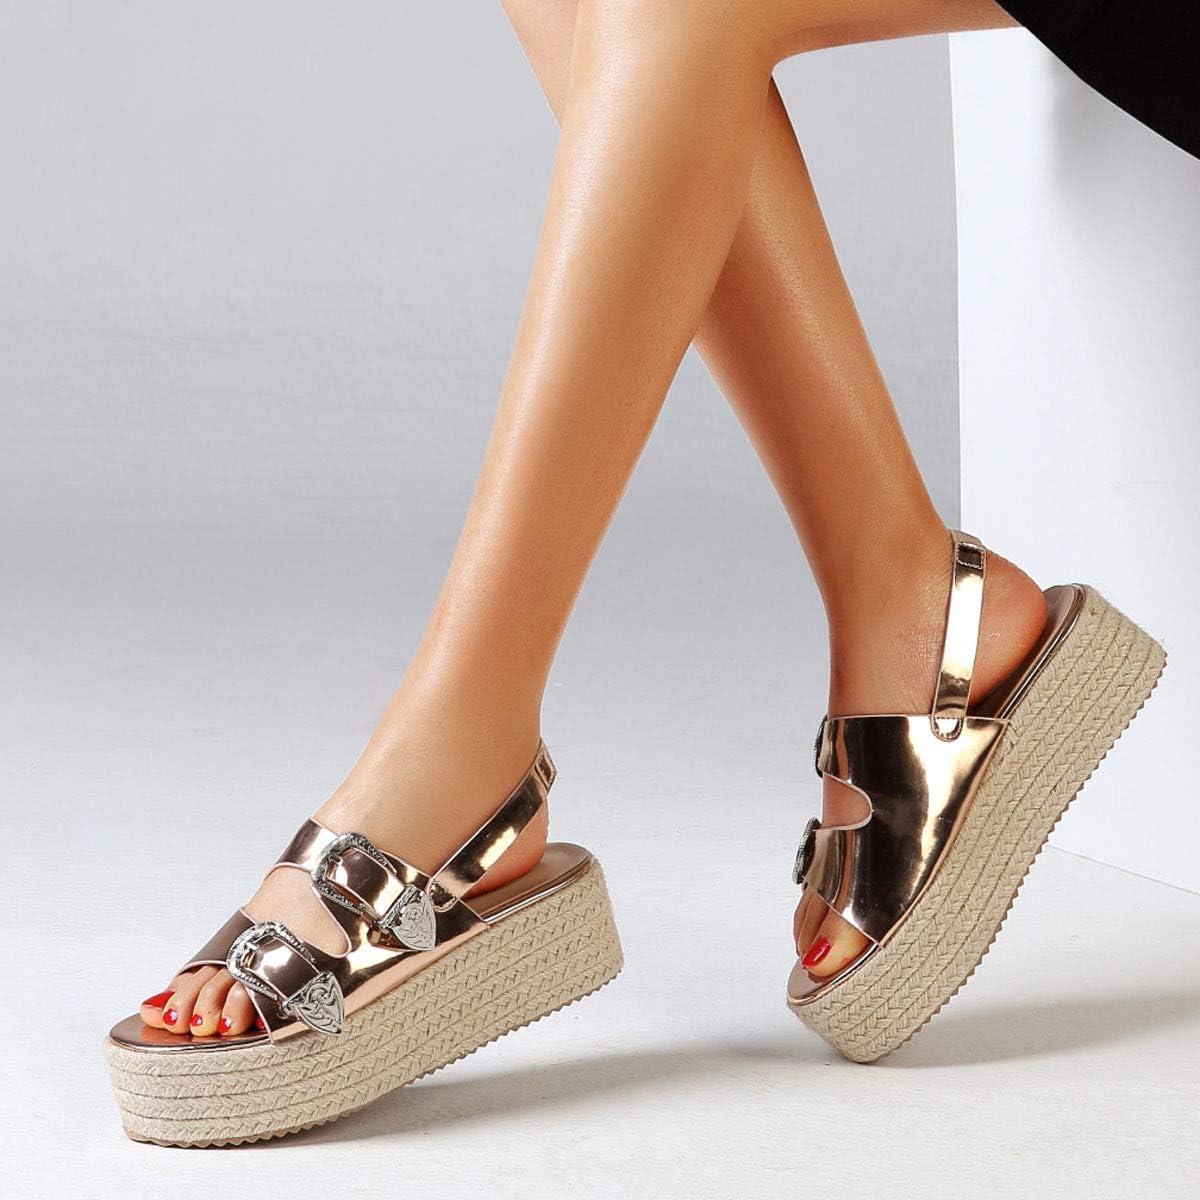 Orangetime Womens Platform Sandals Espadrille Wedge Ankle Strap Studded Open Toe Sandals